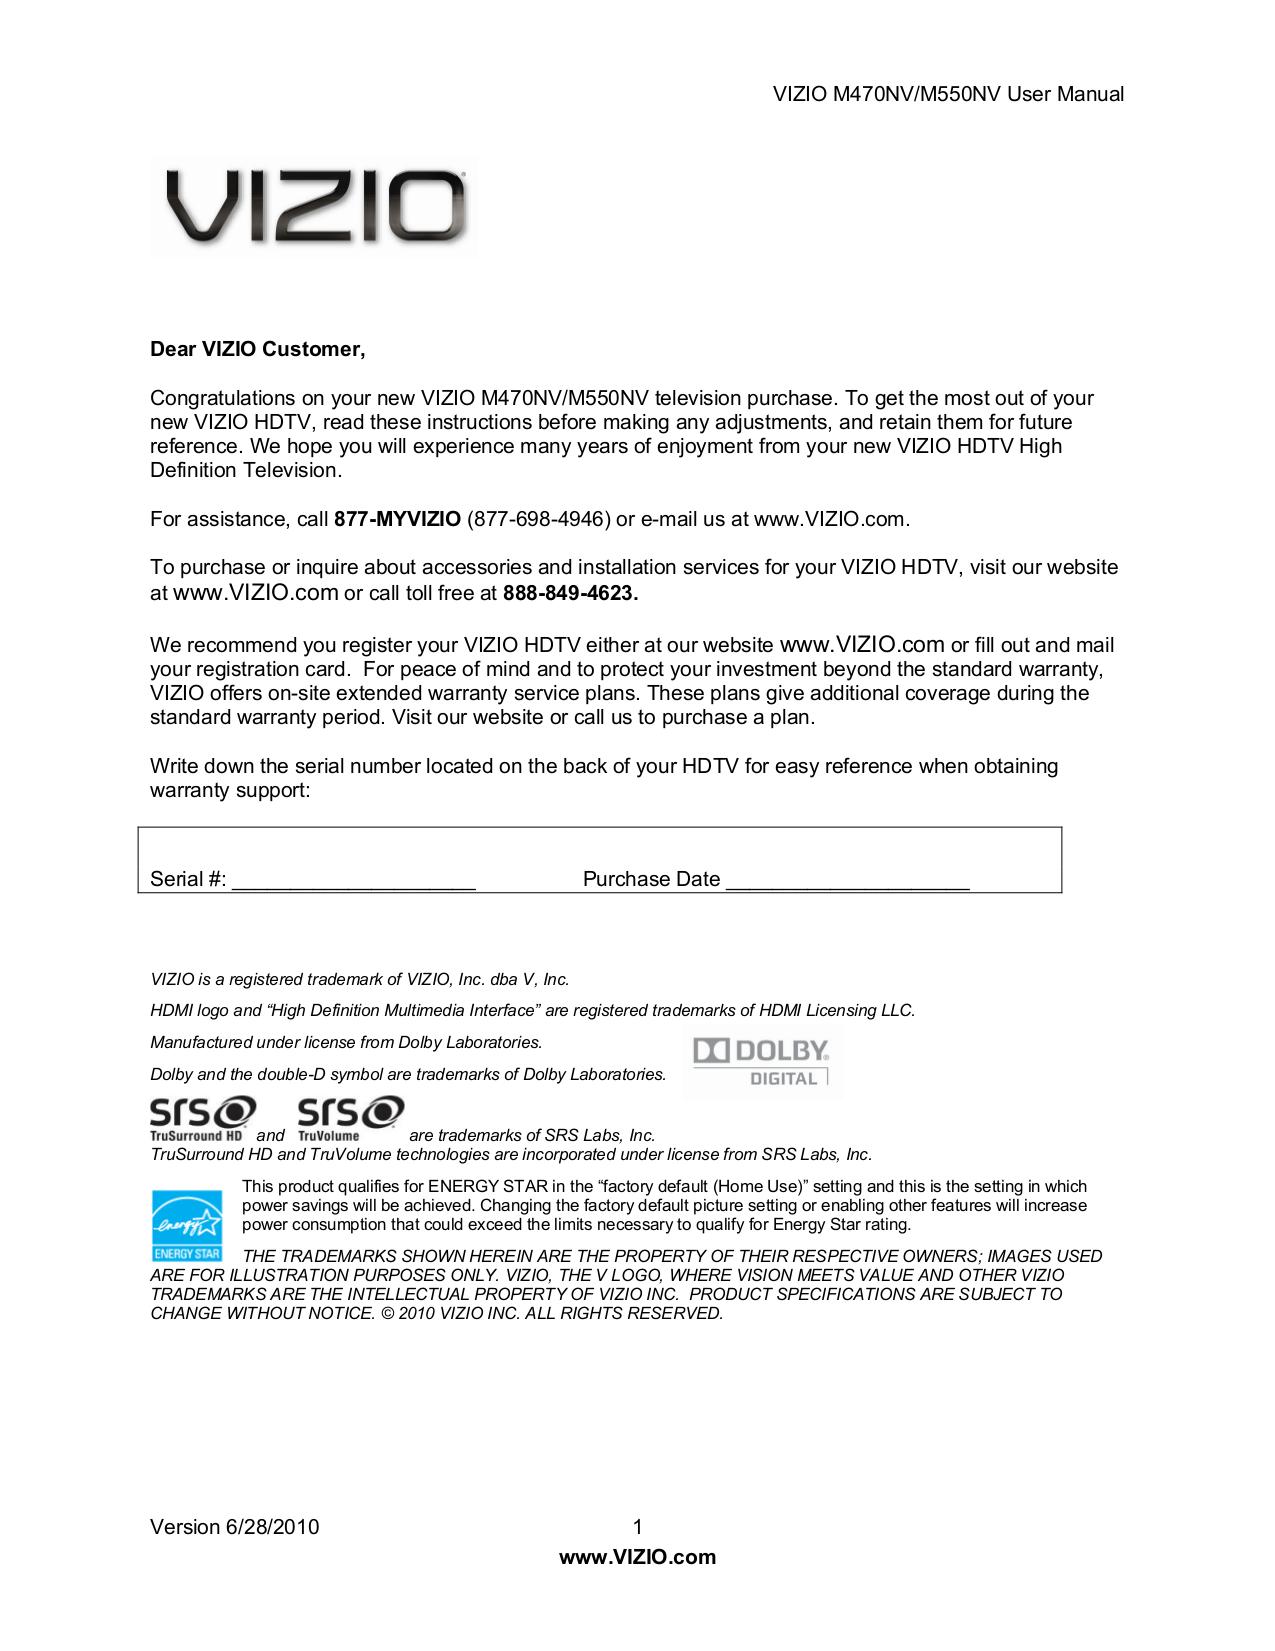 download free pdf for vizio m470nv tv manual rh umlib com vizio m370nv manual Vizio M470NV Razor LED